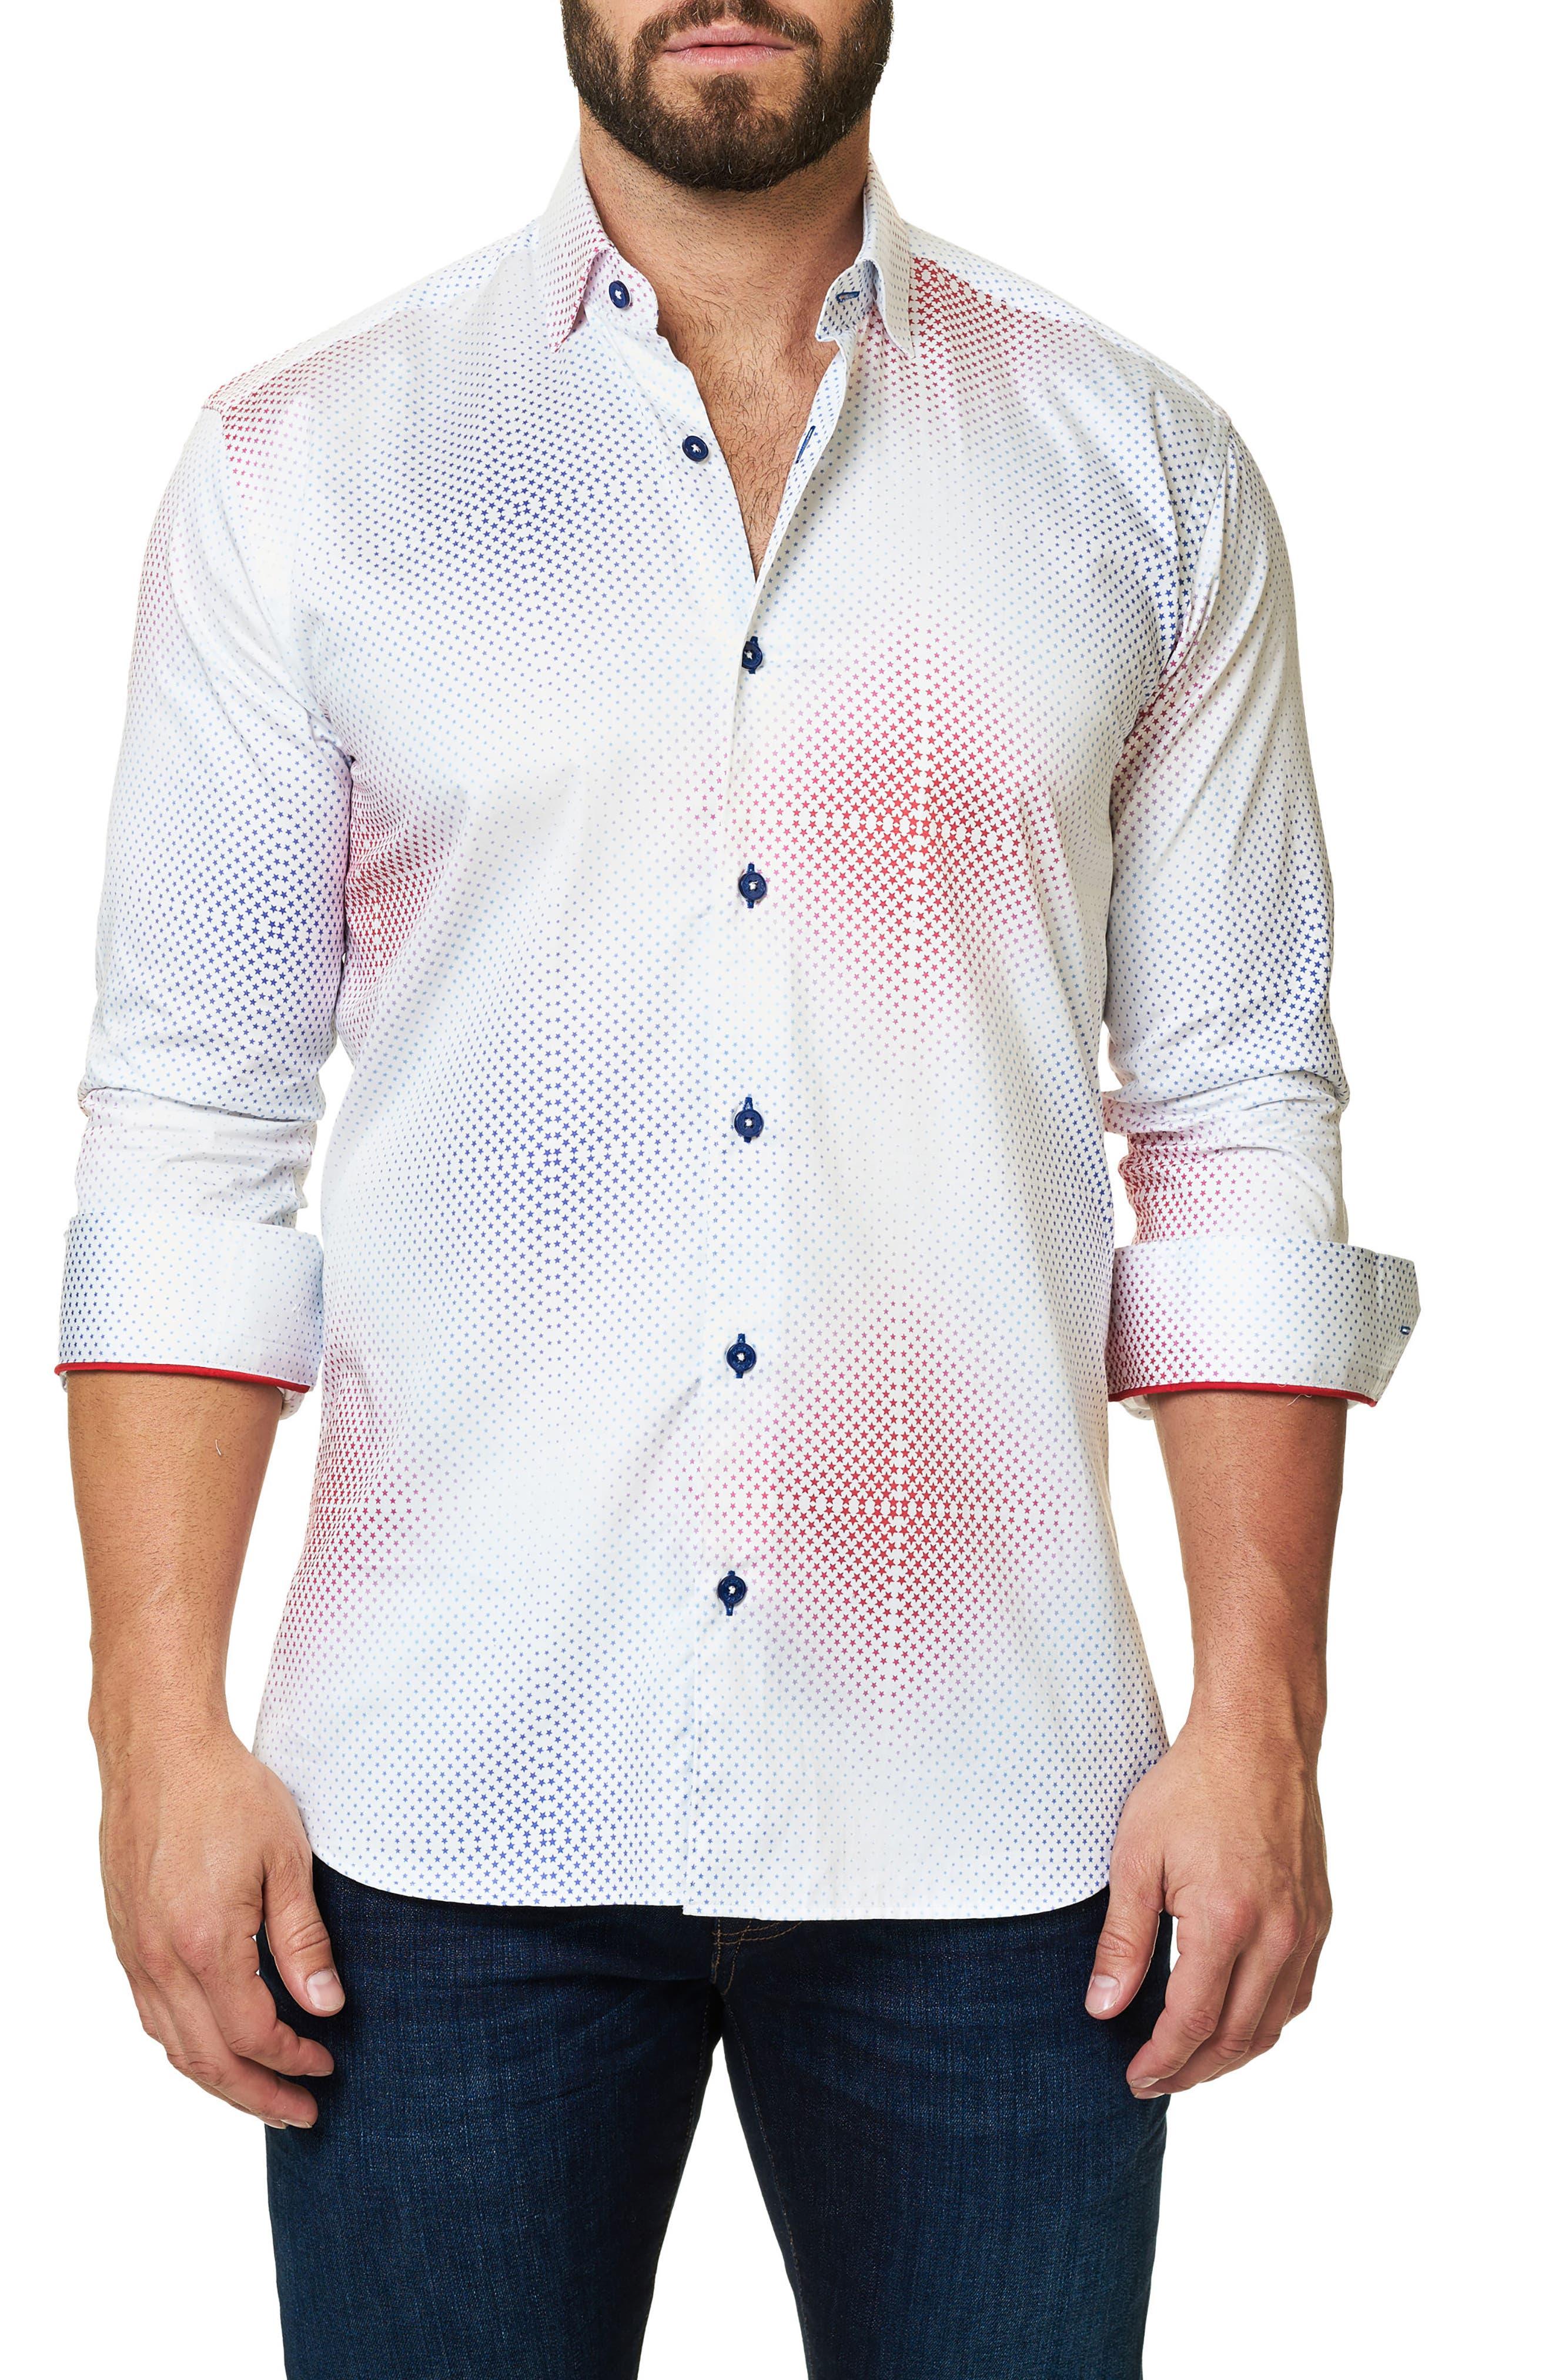 Main Image - Maceoo Trim Fit Ombré Star Sport Shirt